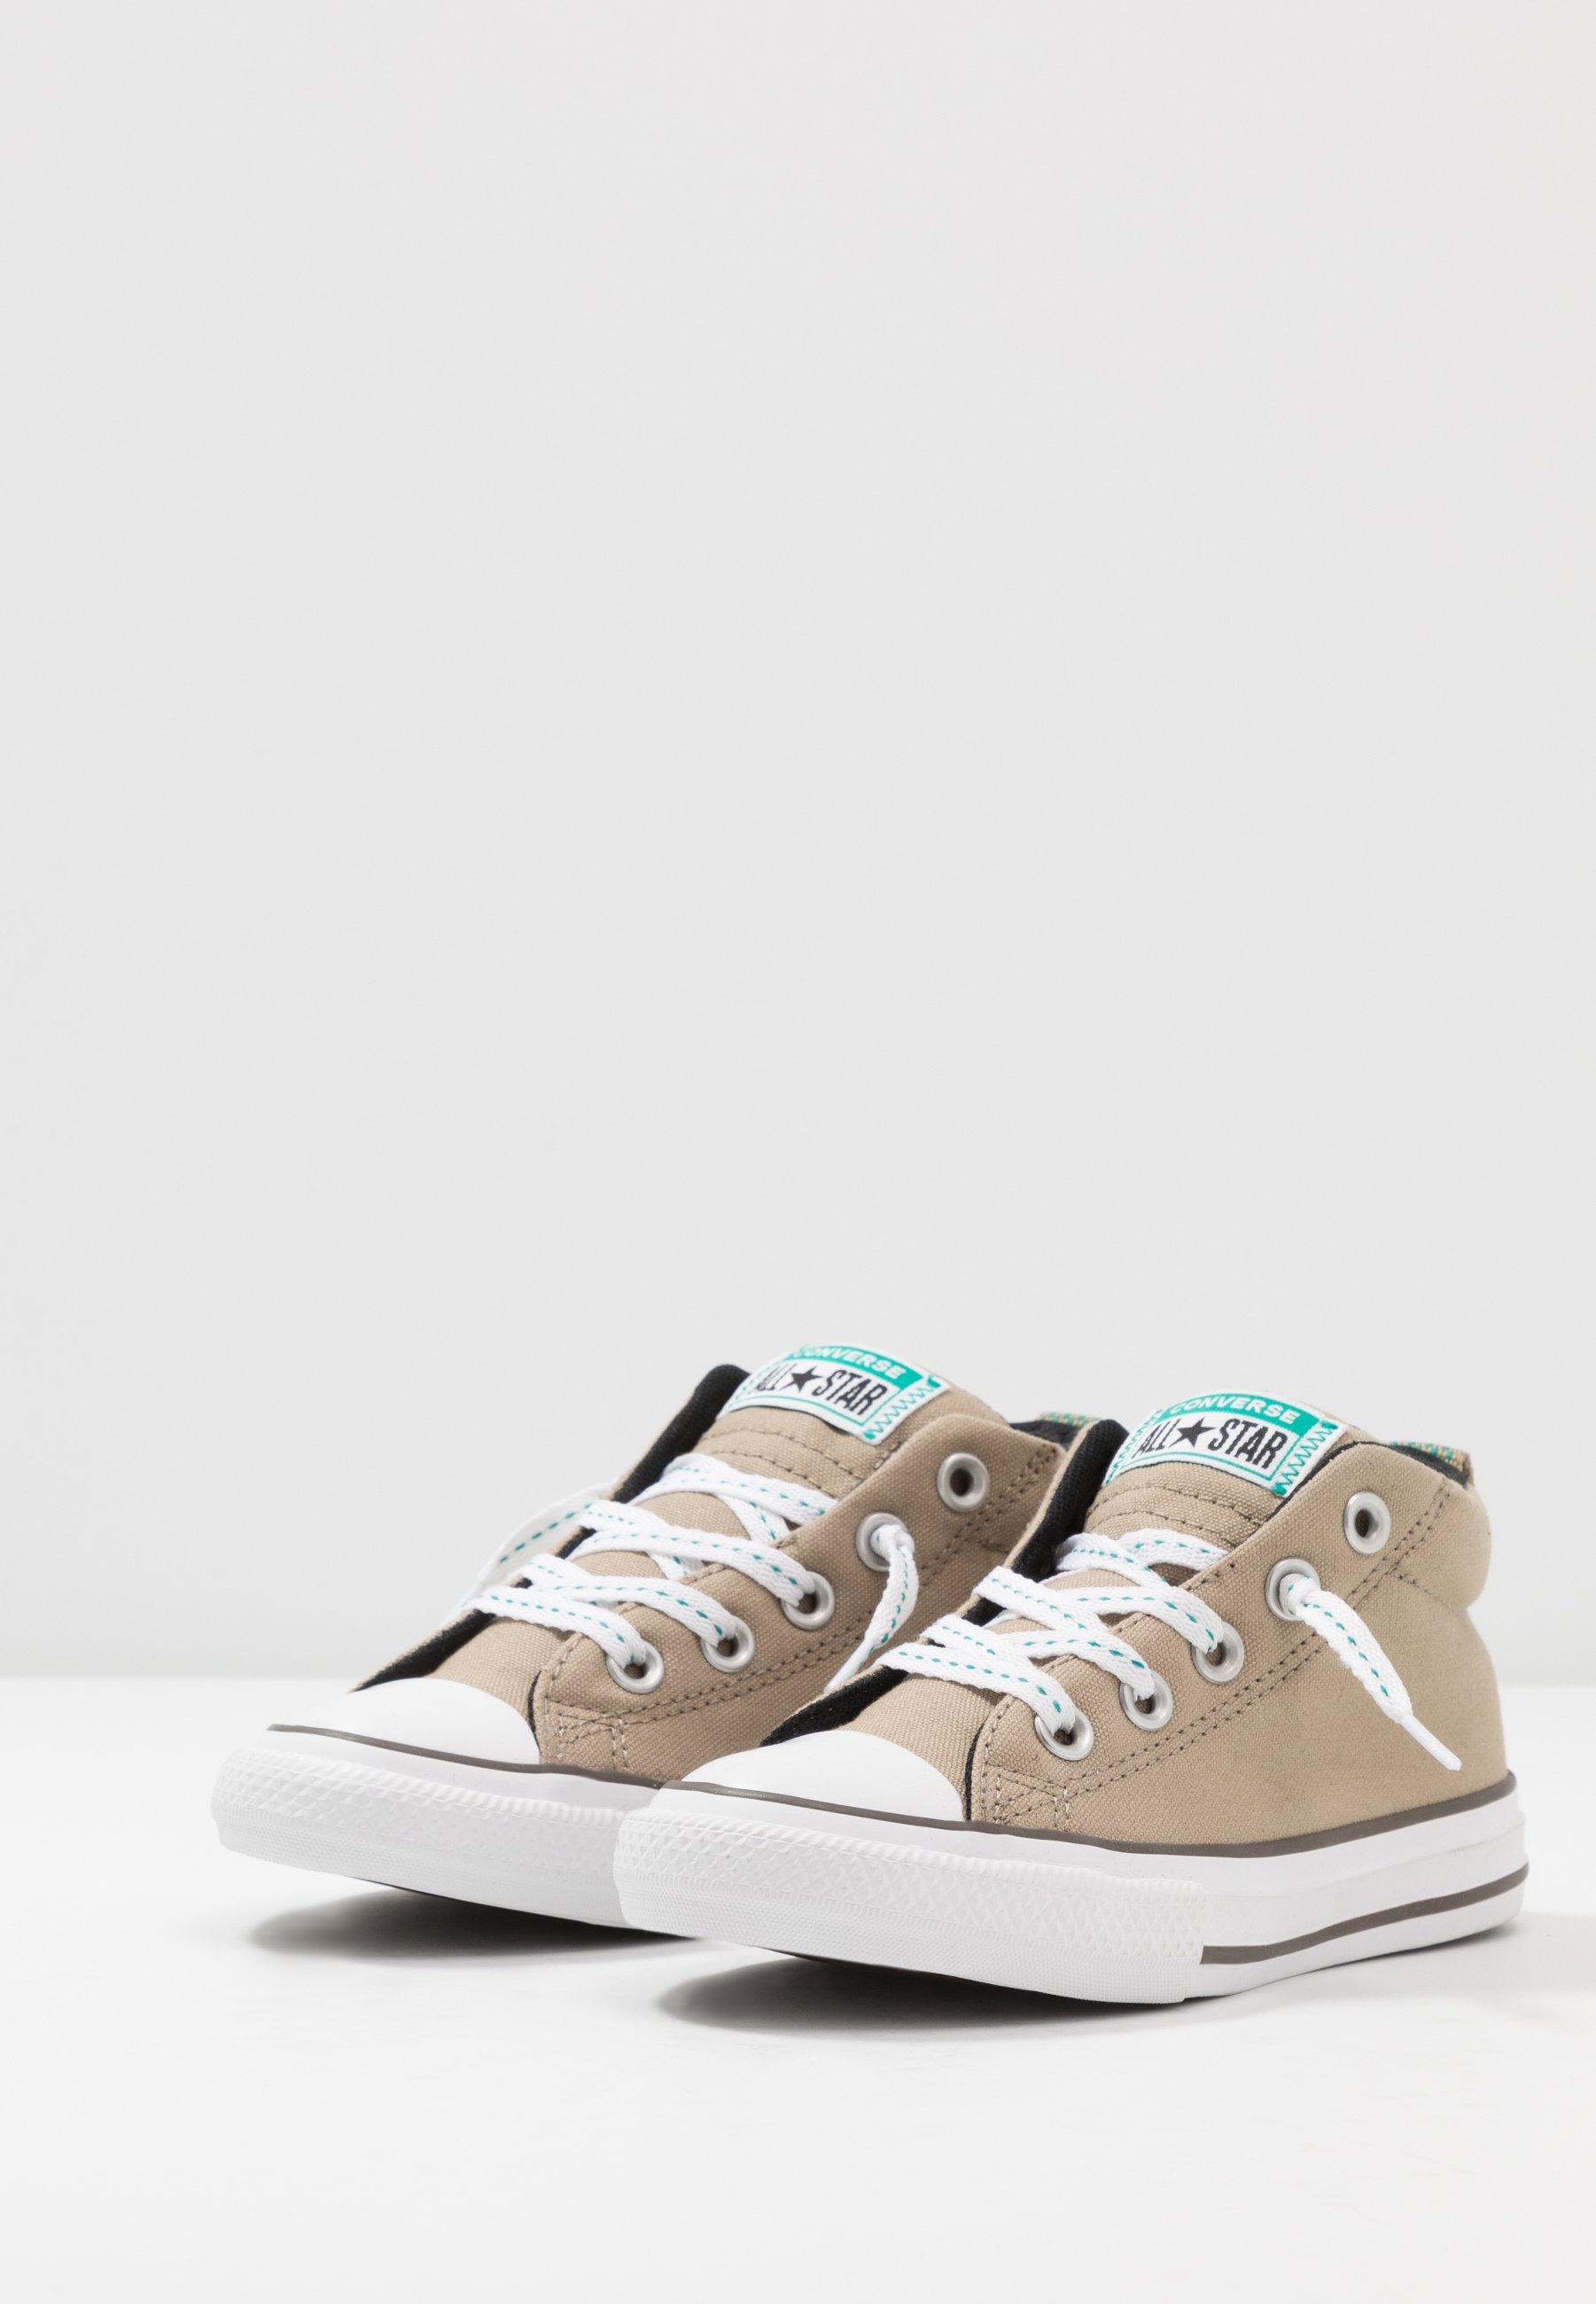 converse kaki